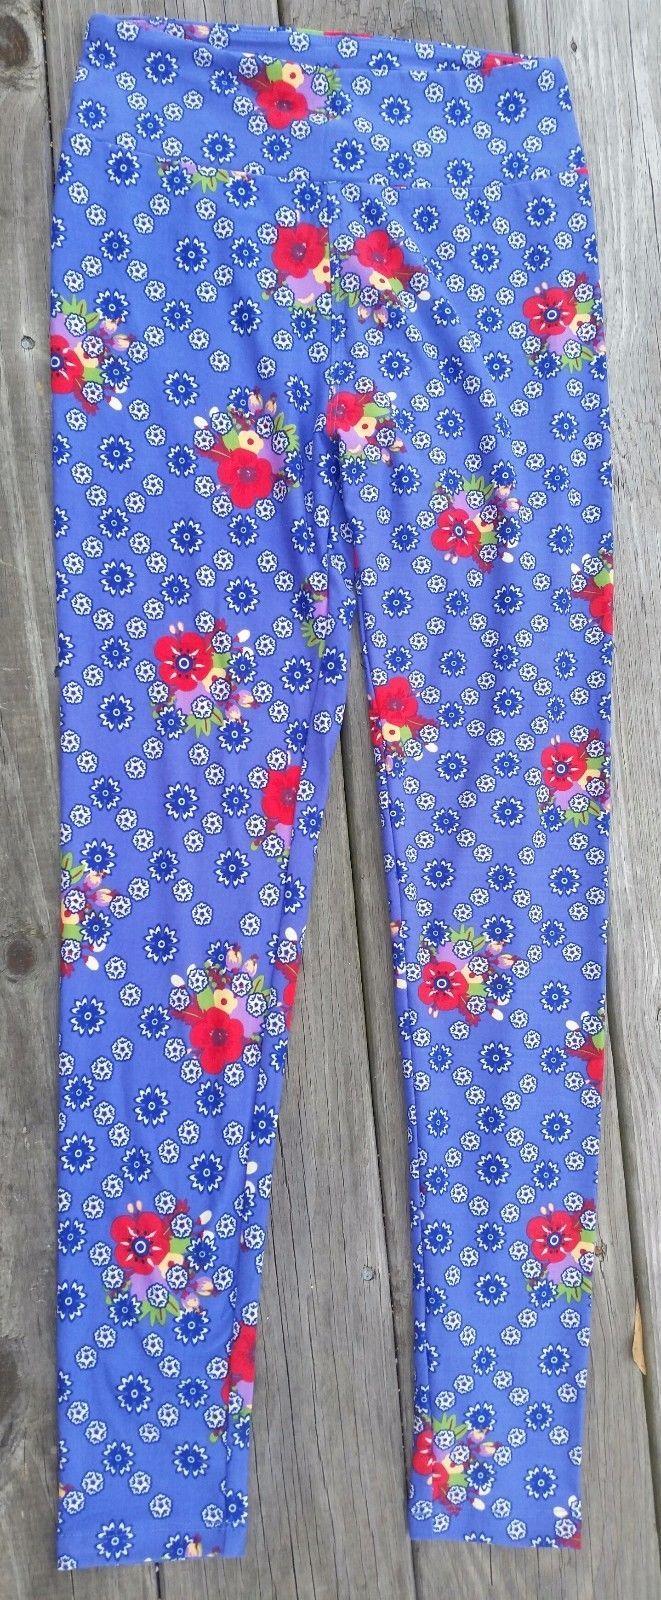 Lularoe OS One size Purpley Blue Floral Leggings Brand New So Cute! image 2